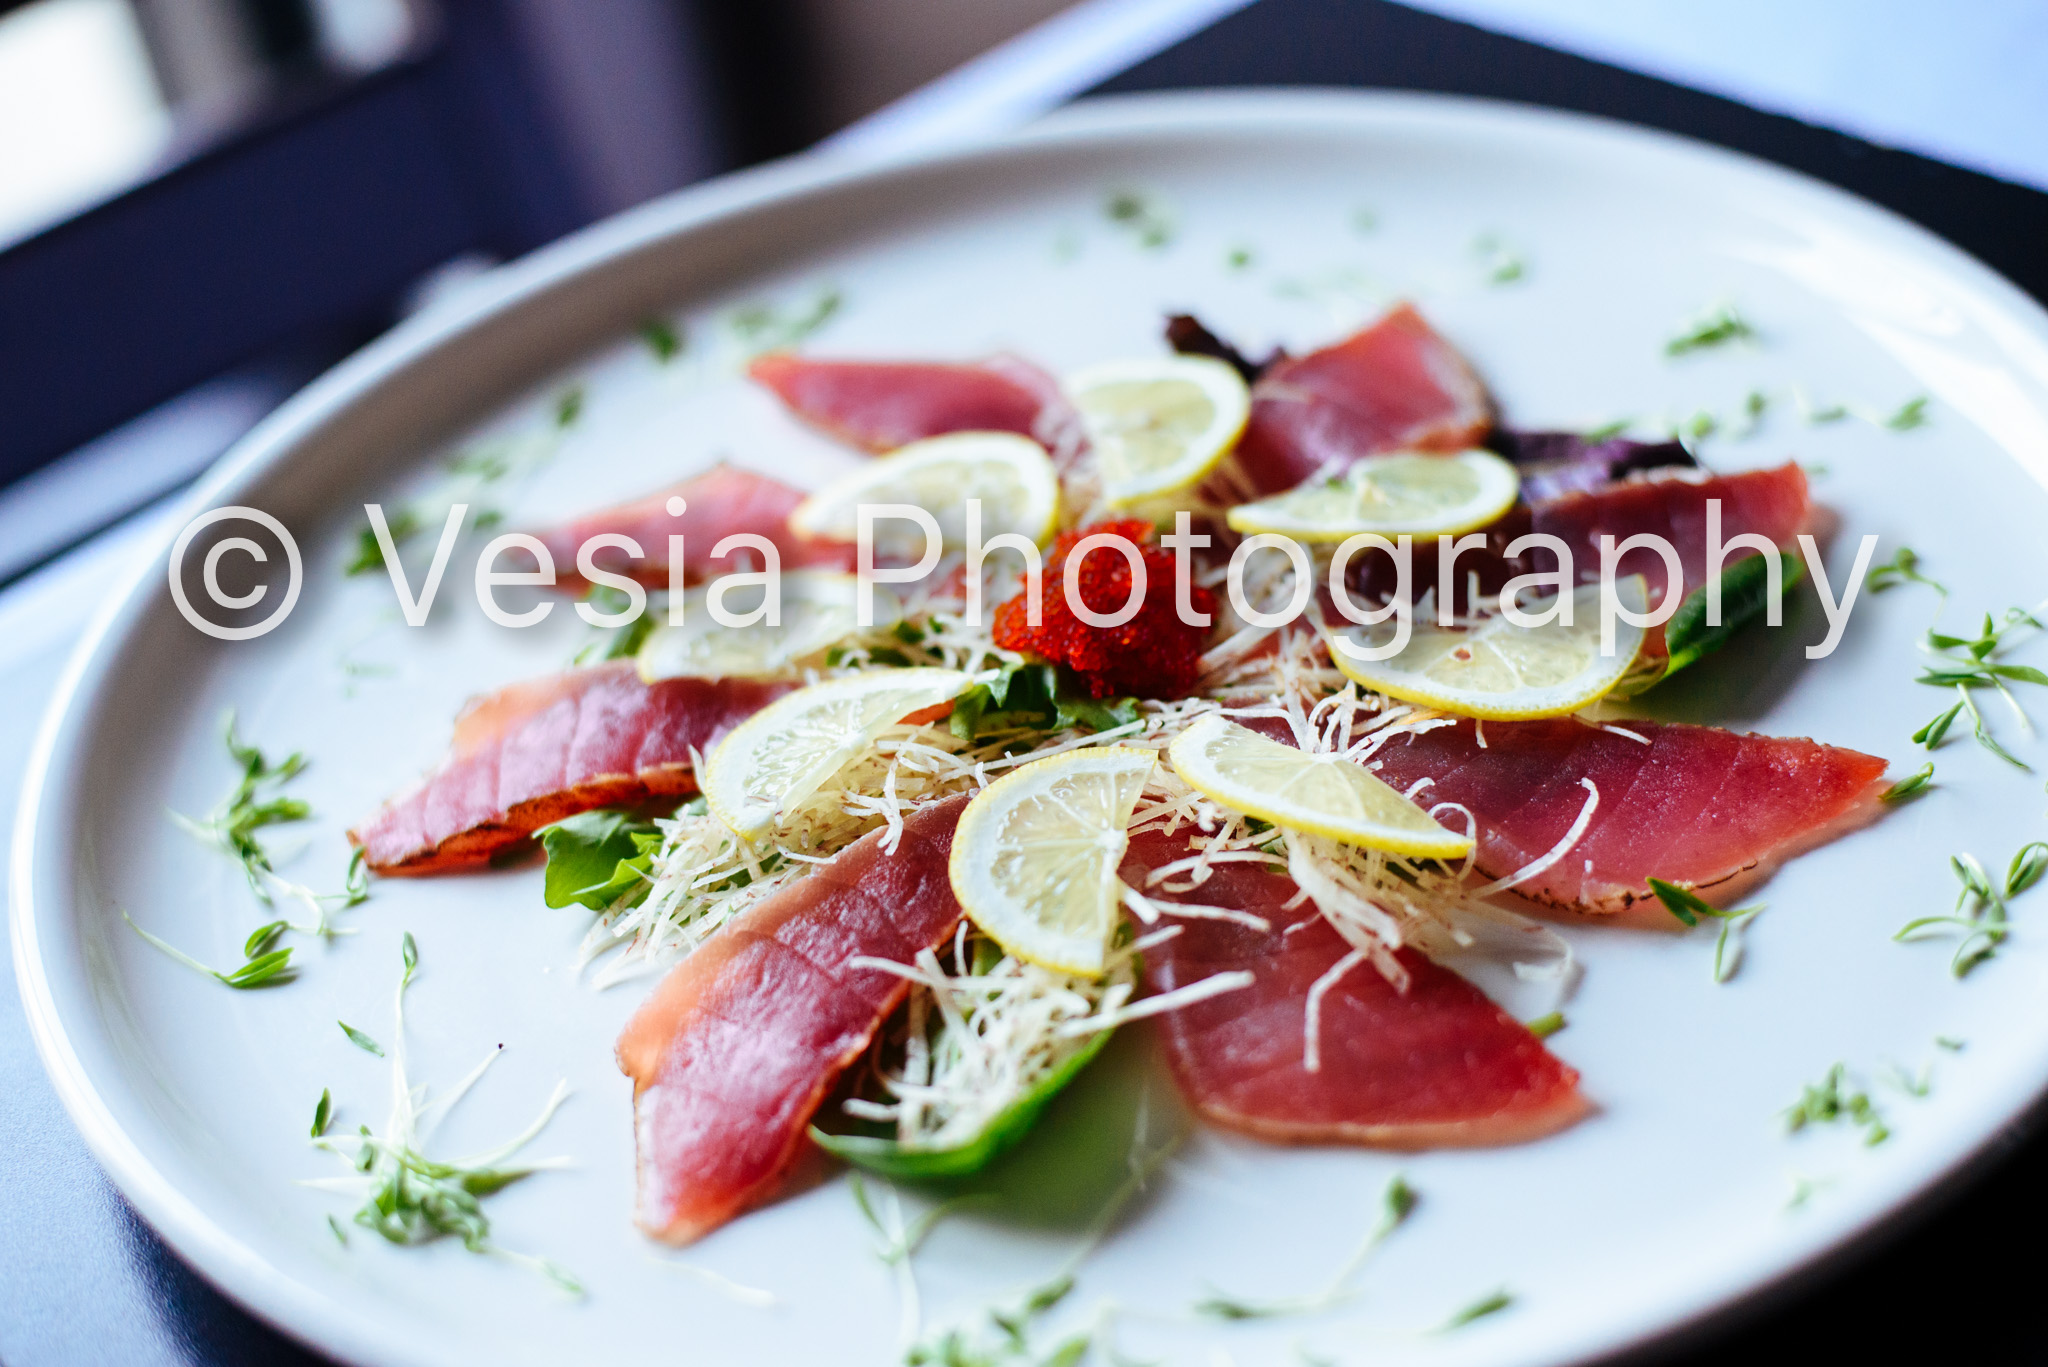 Caviar_Sushi_Proofs-1.jpg